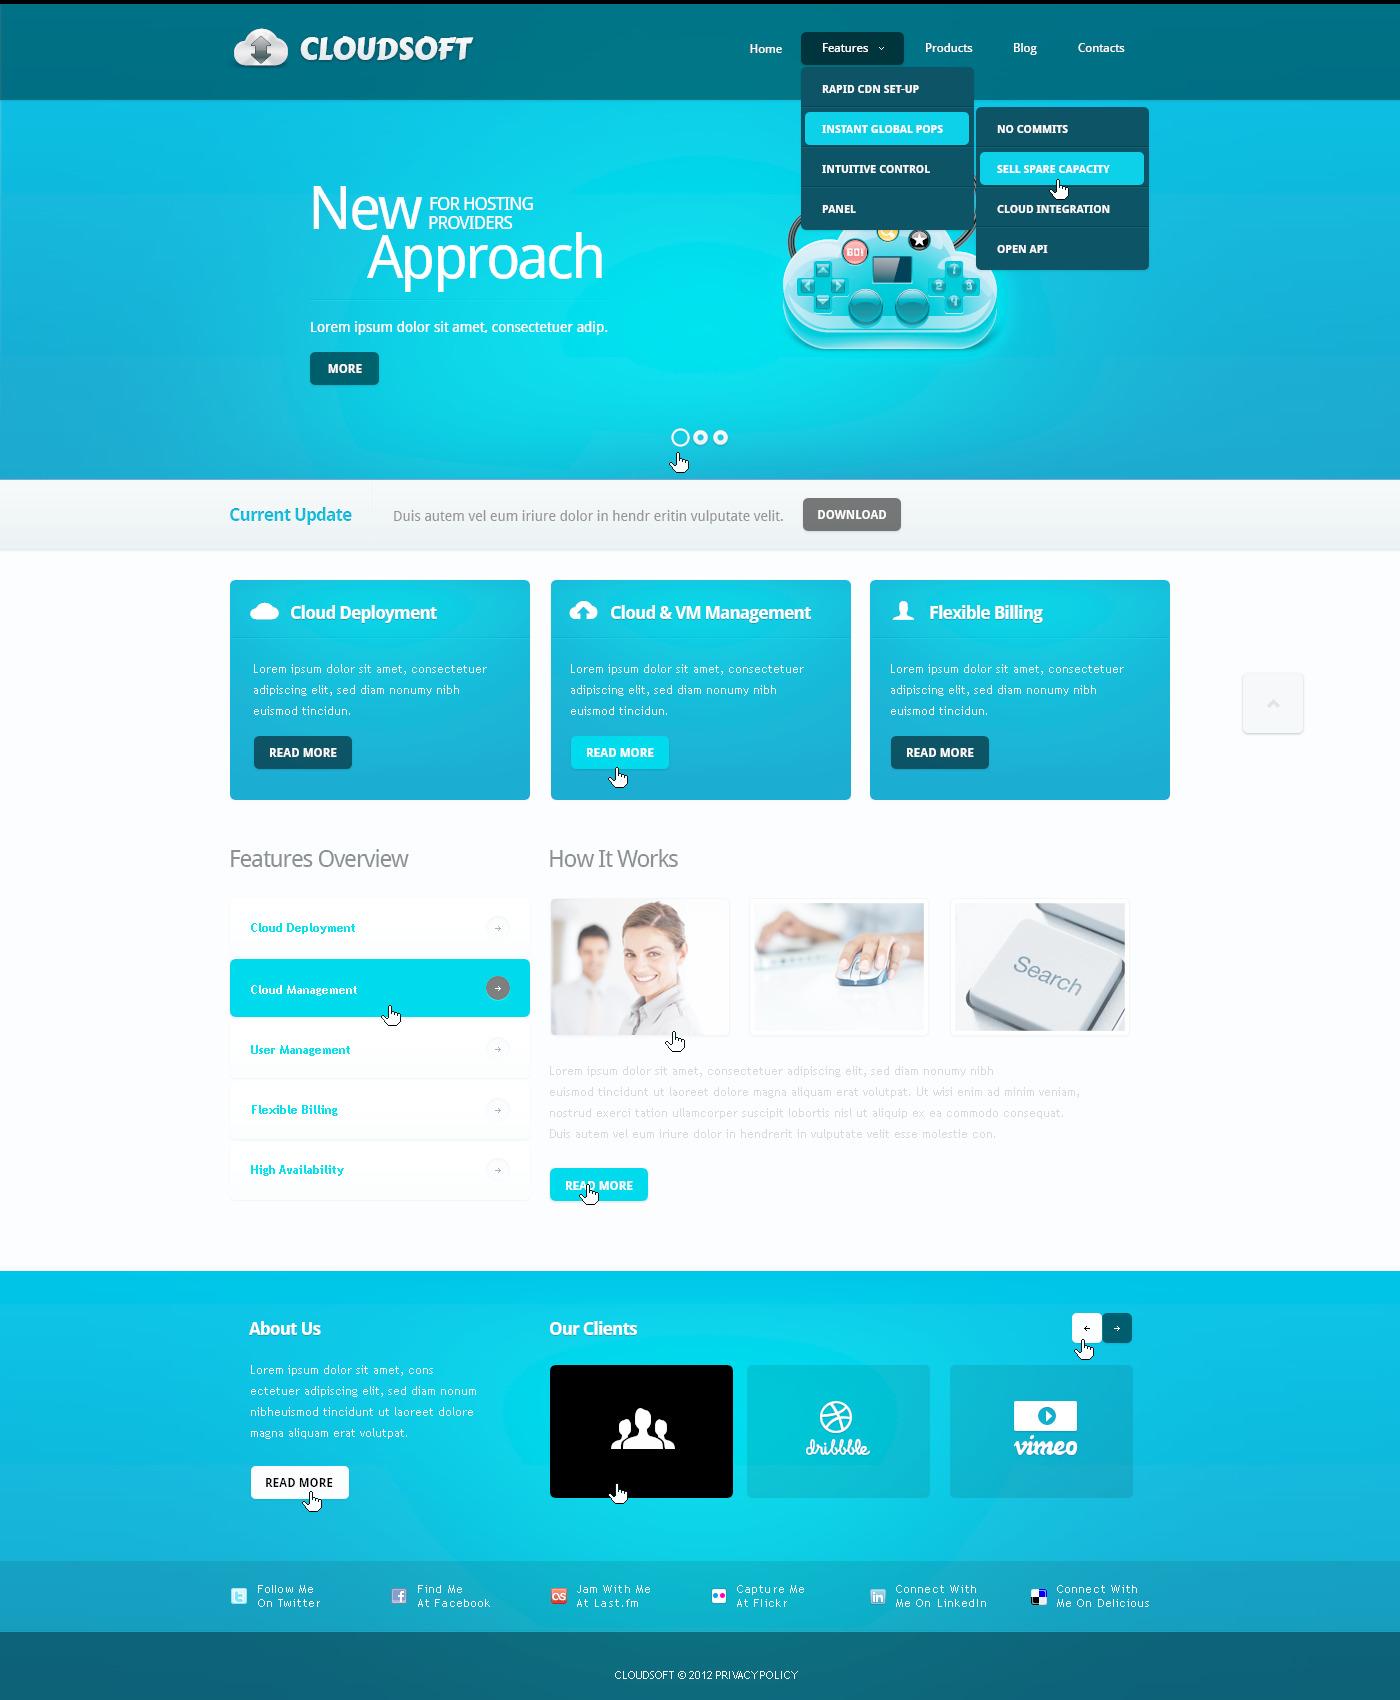 Szablon PSD #57396 na temat: biznes i usługi - zrzut ekranu